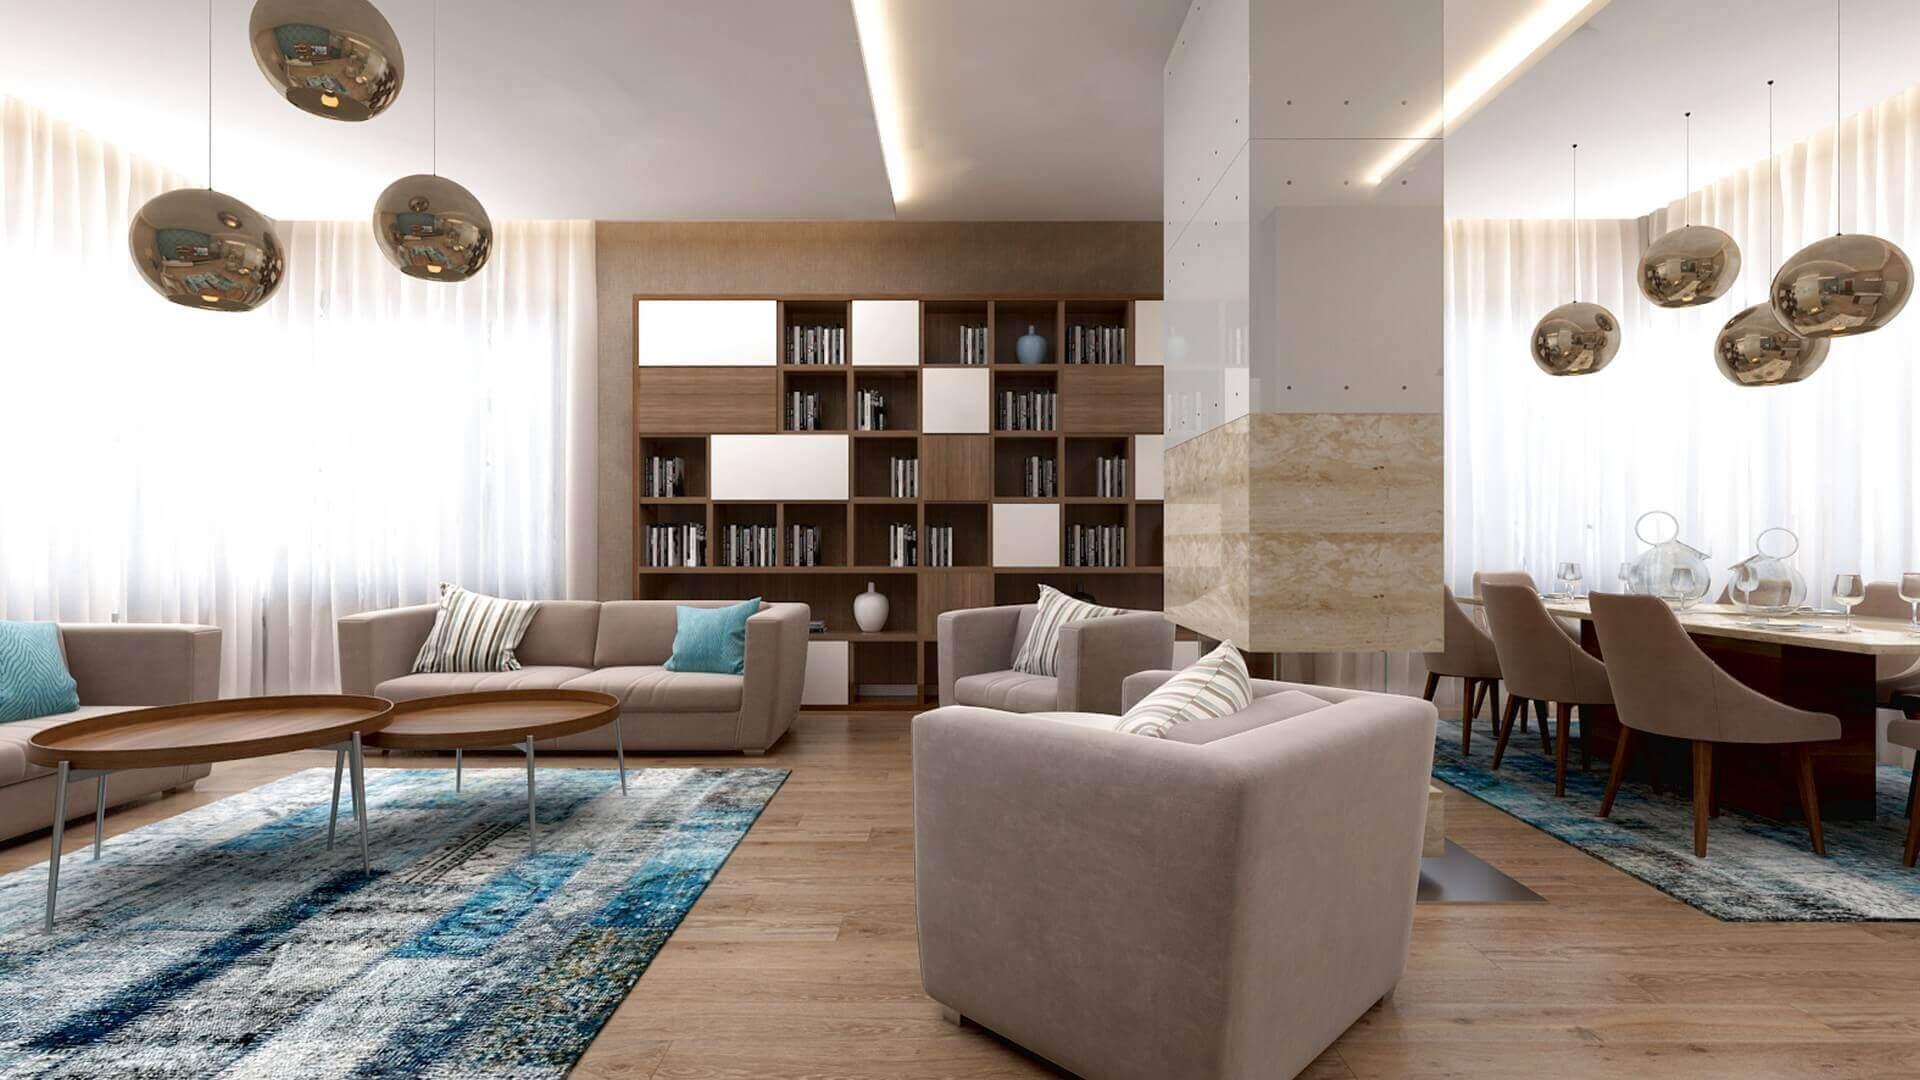 House interior architecture 2951 E. Uslu Konutu Residential